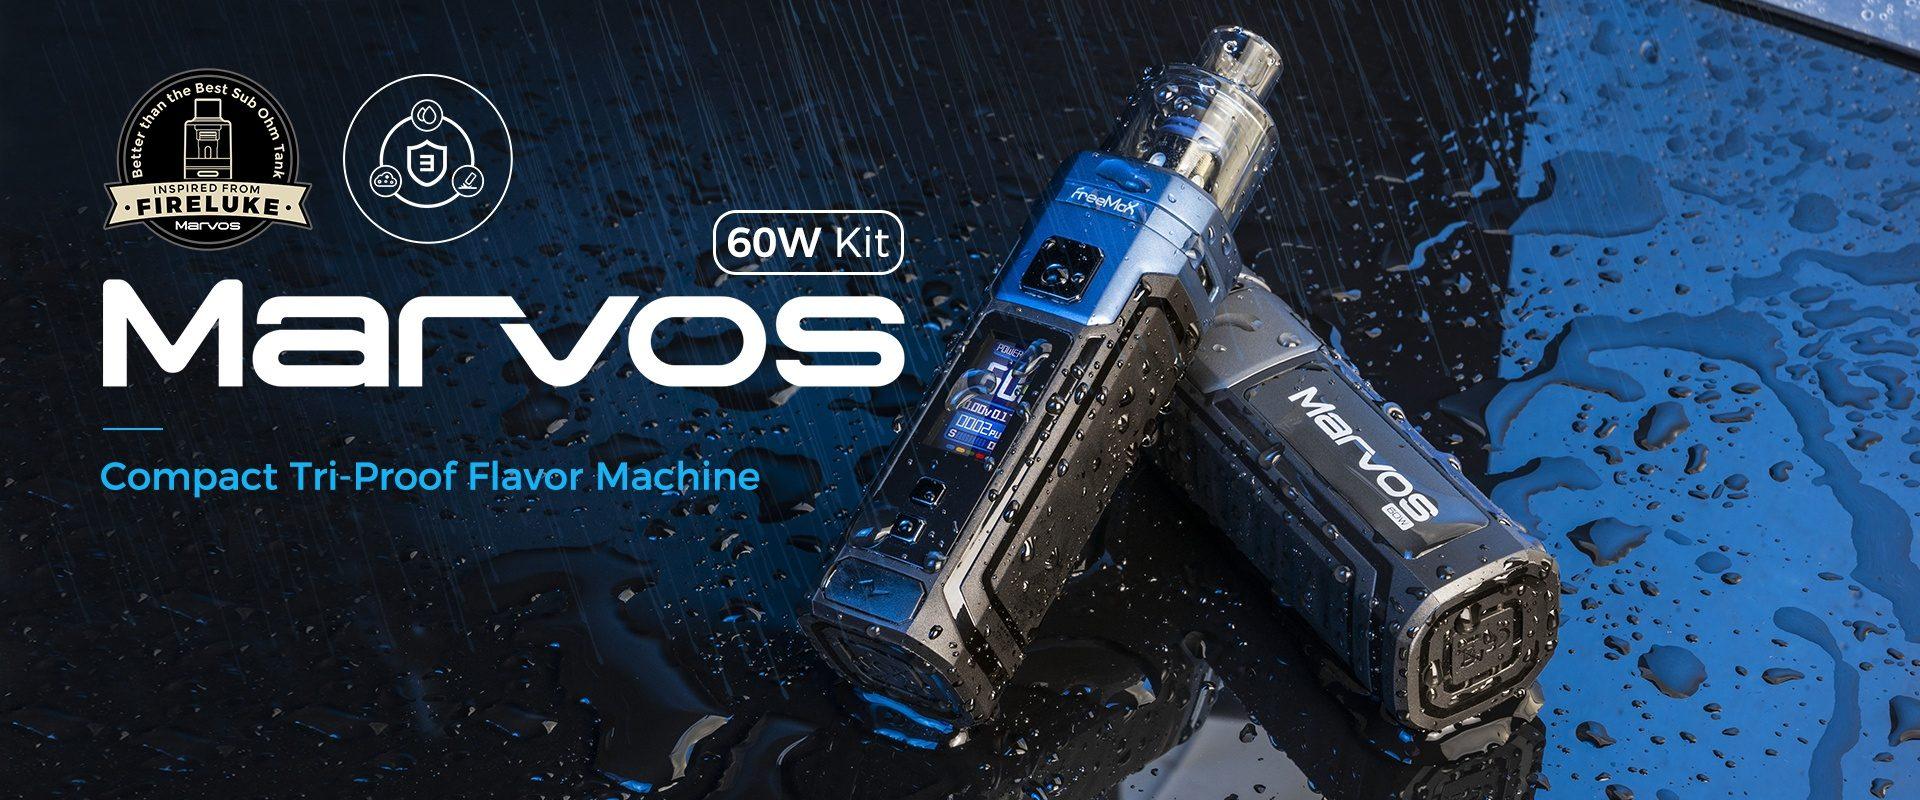 Marvos-60W-Kit-Banner